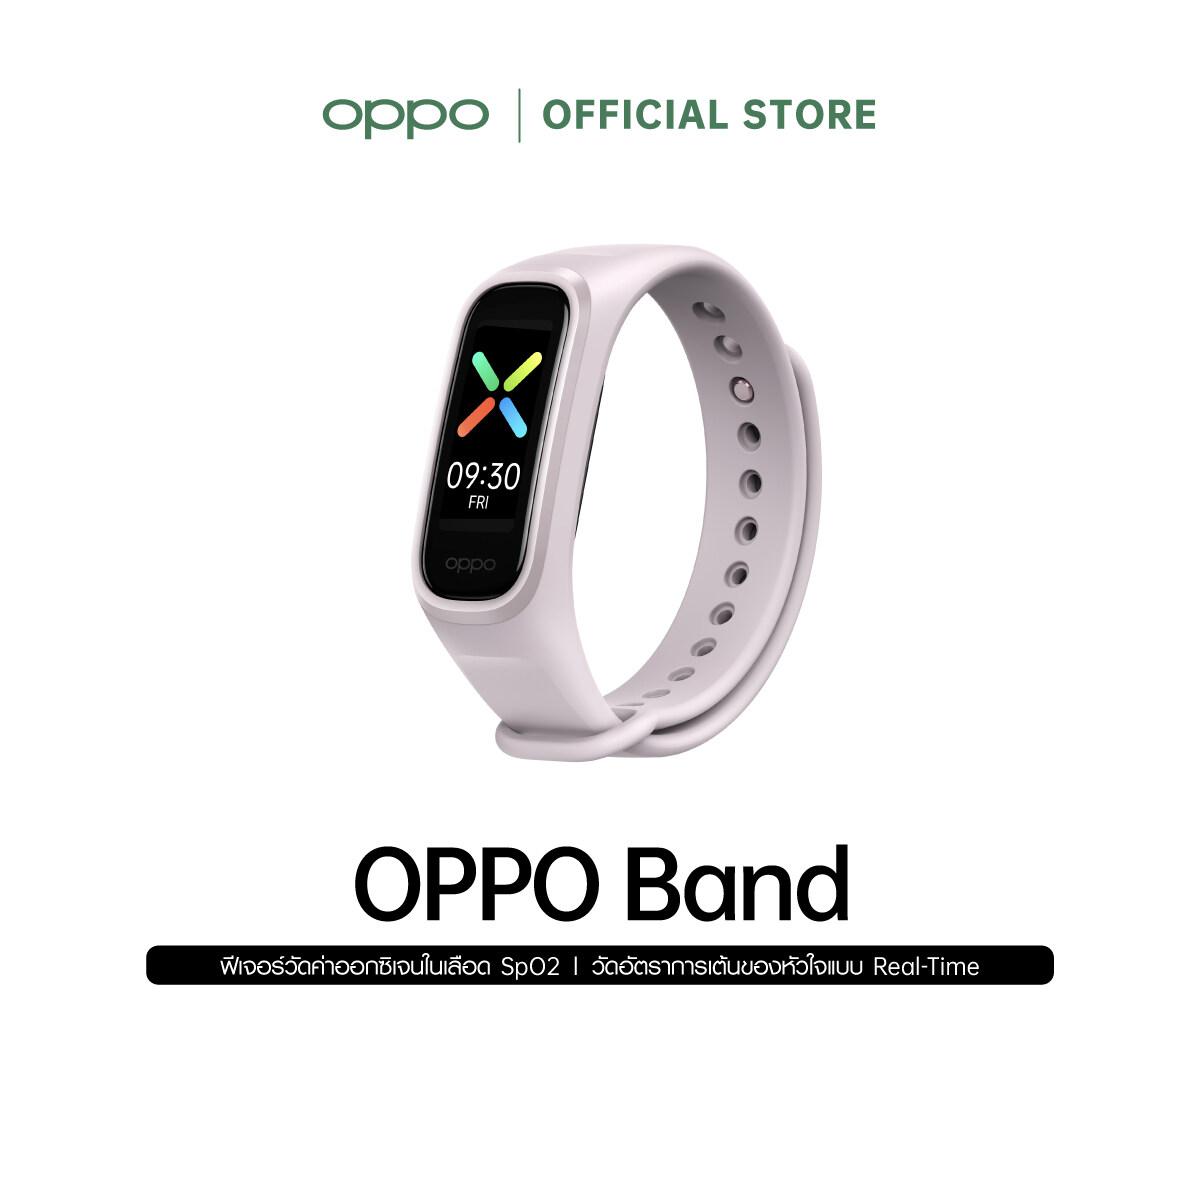 [New] OPPO Band สายรัดข้อมืออัจฉริยะ หน้าจอ 1.1 นิ้ว 16 MB รับประกัน 12 เดือน